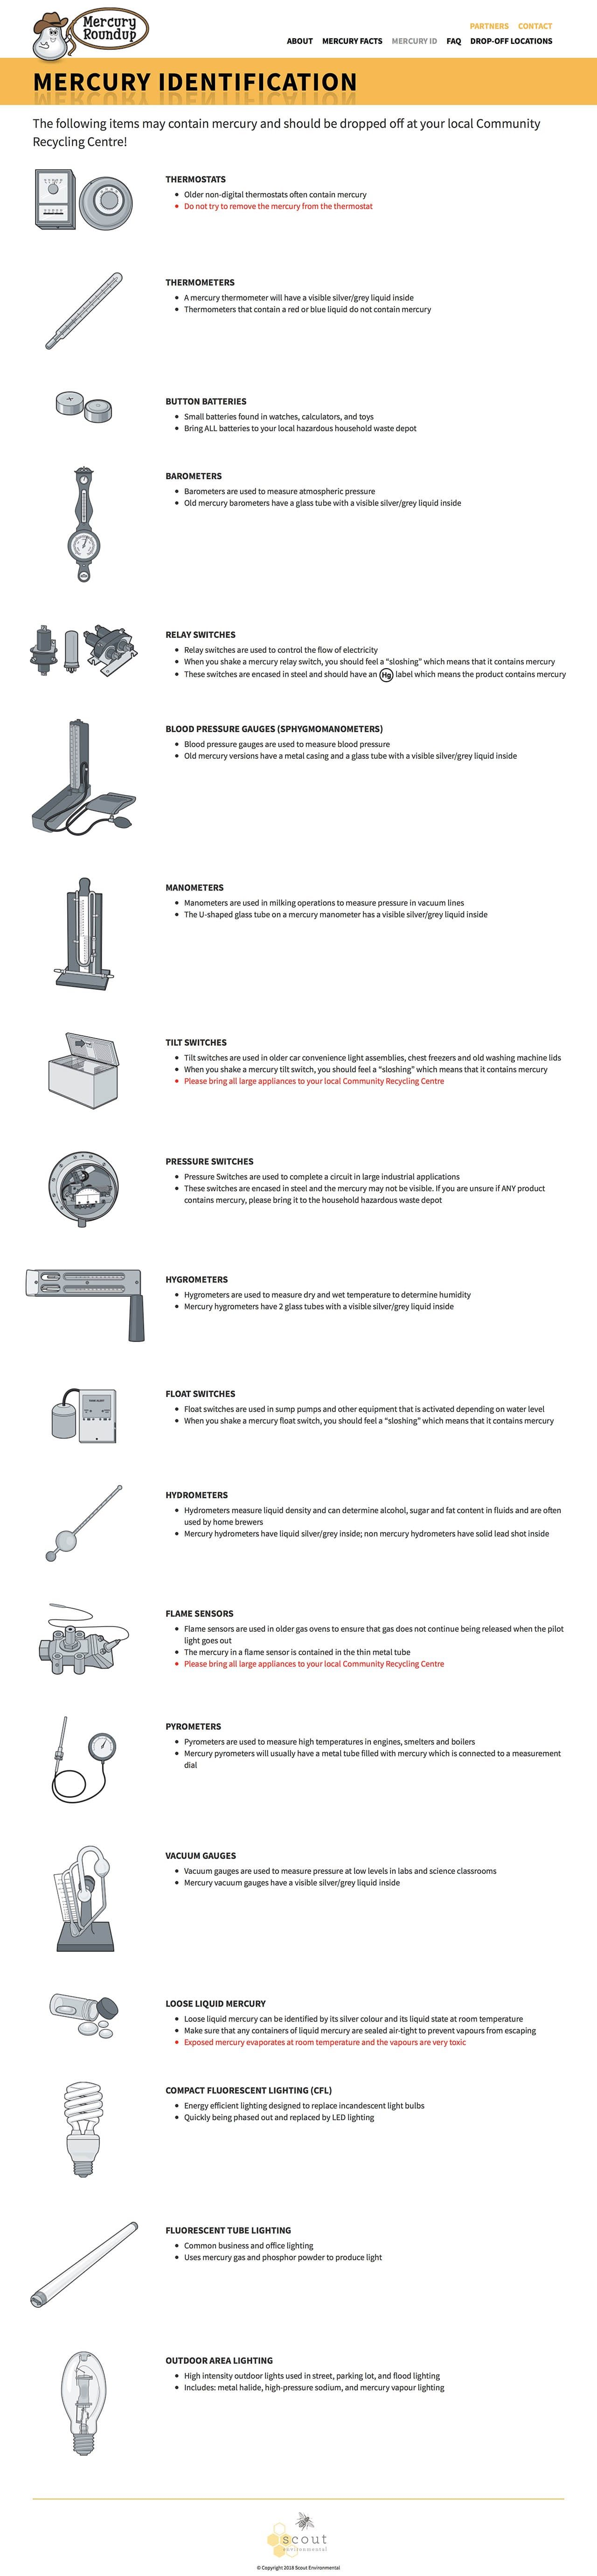 Mercury Identification Desktop